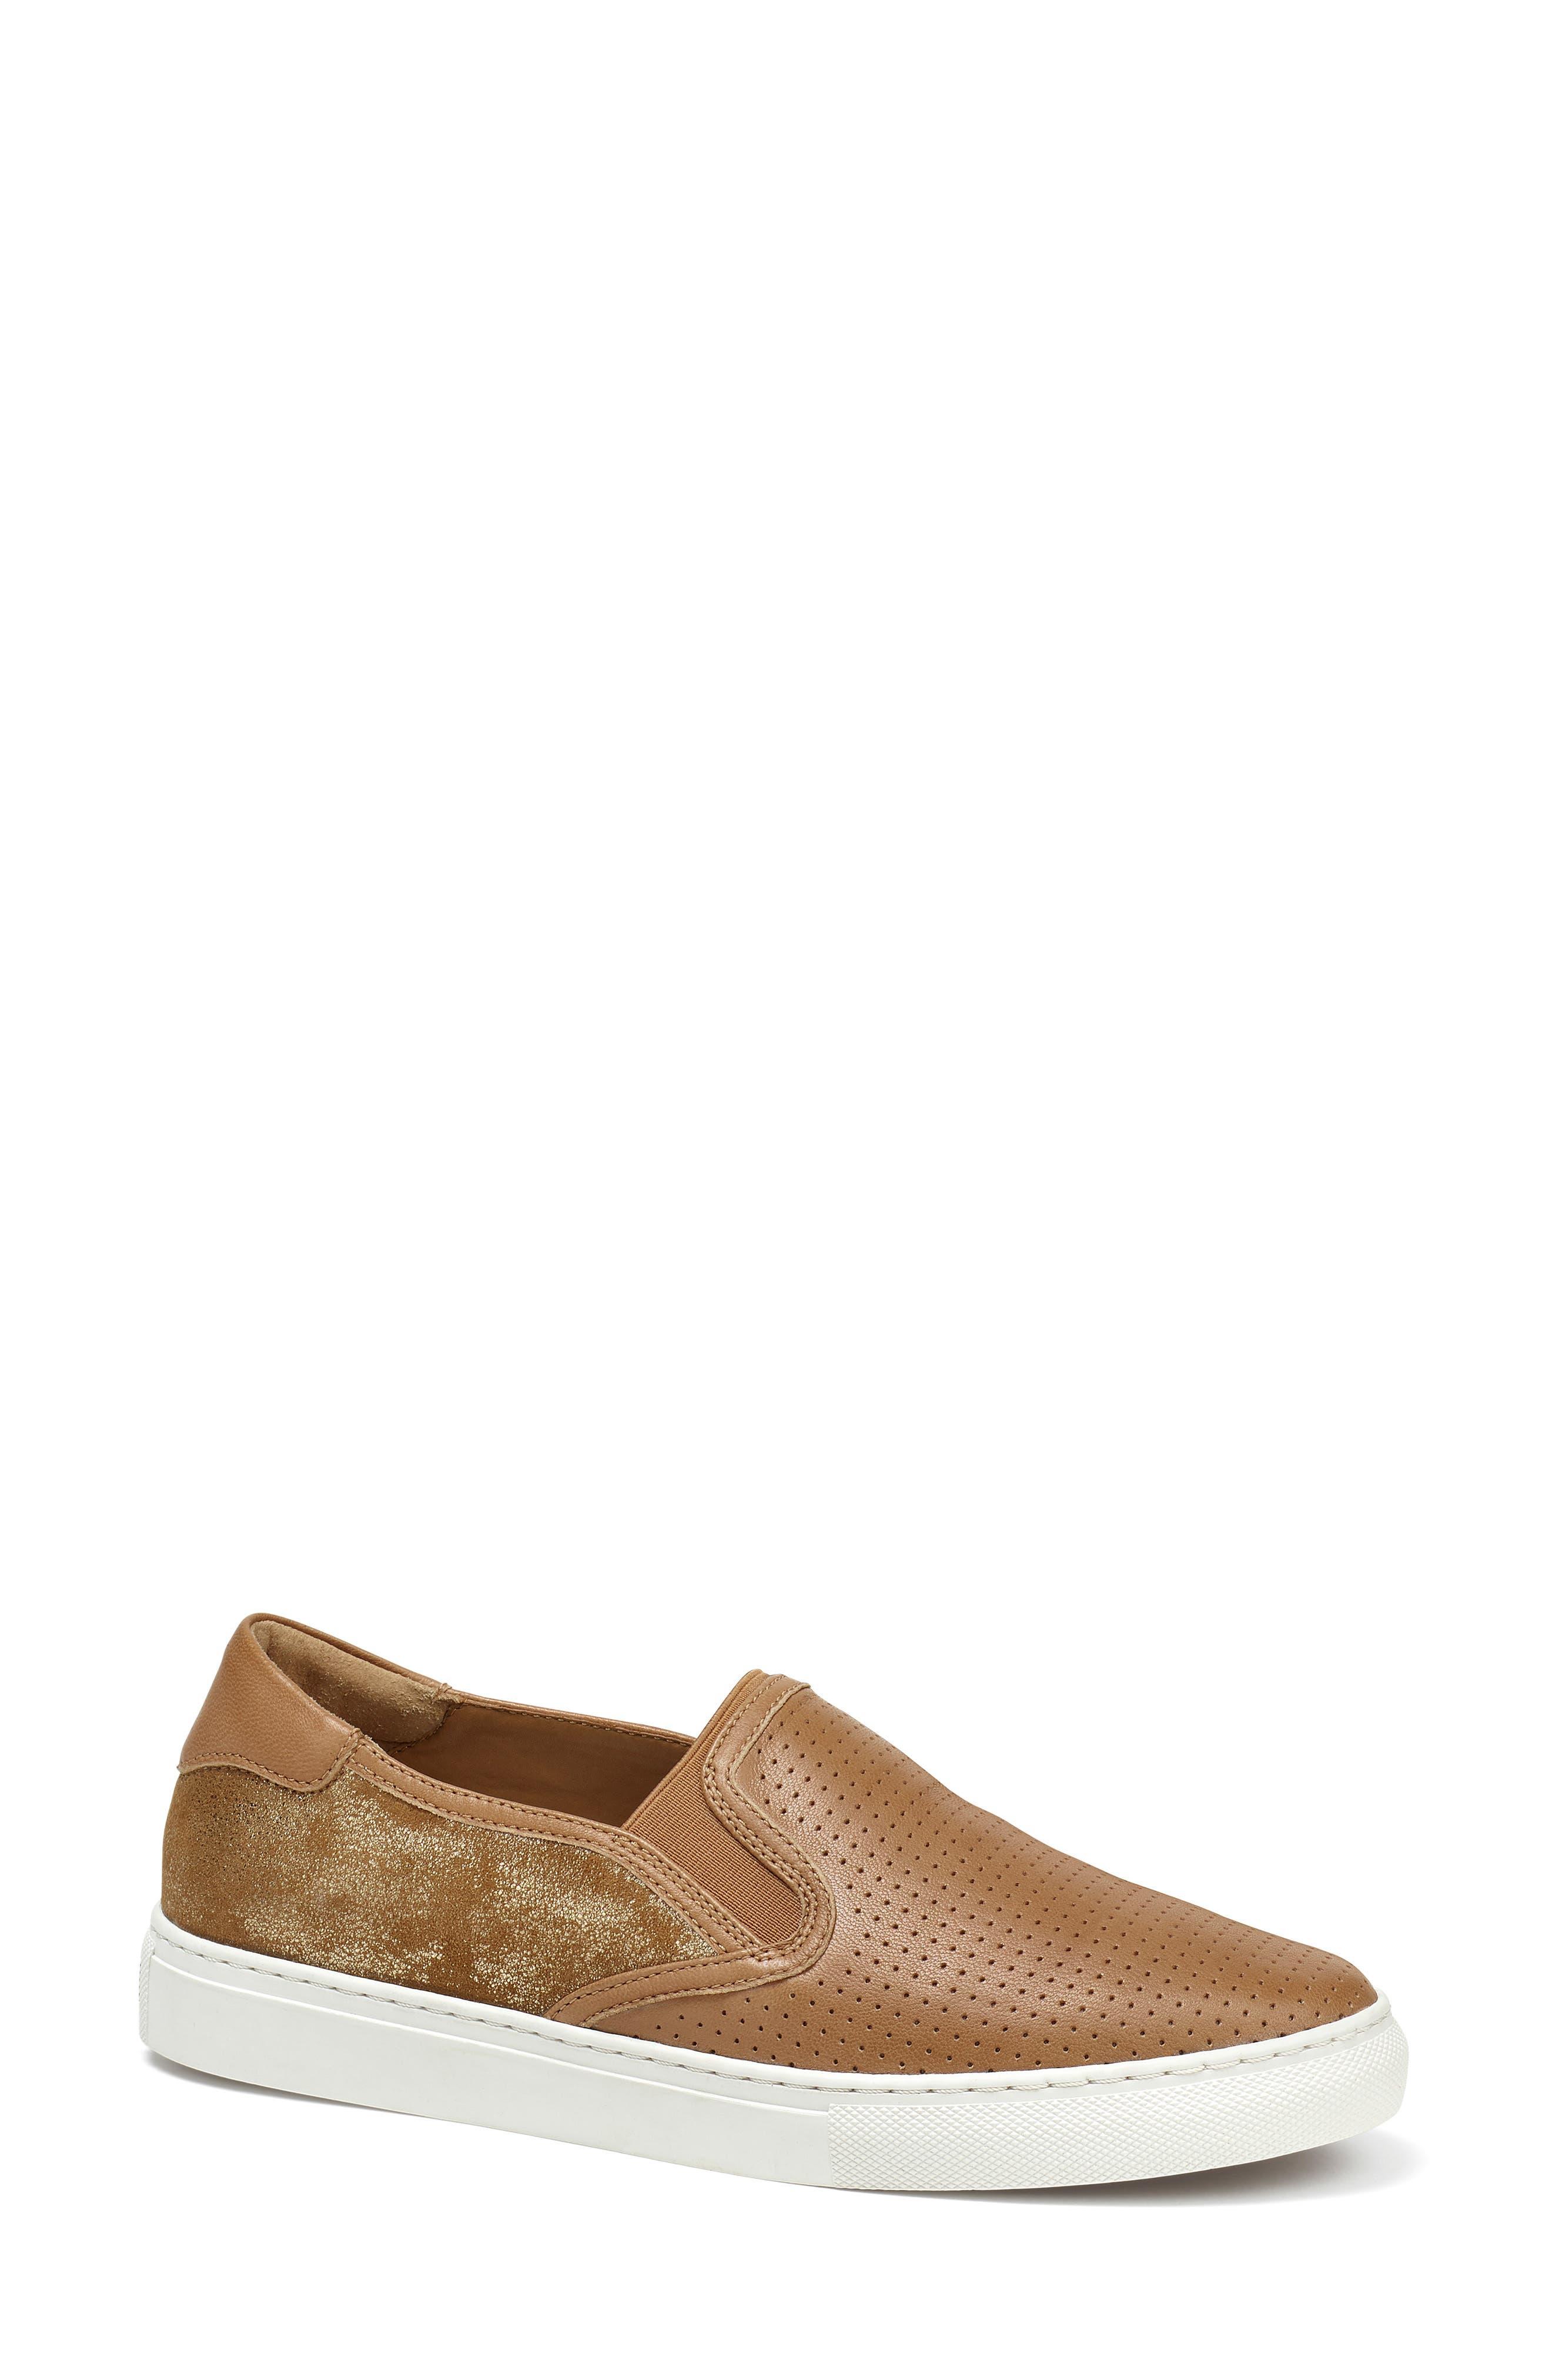 Trask Lillian Water Resistant Slip-On Sneaker- Brown